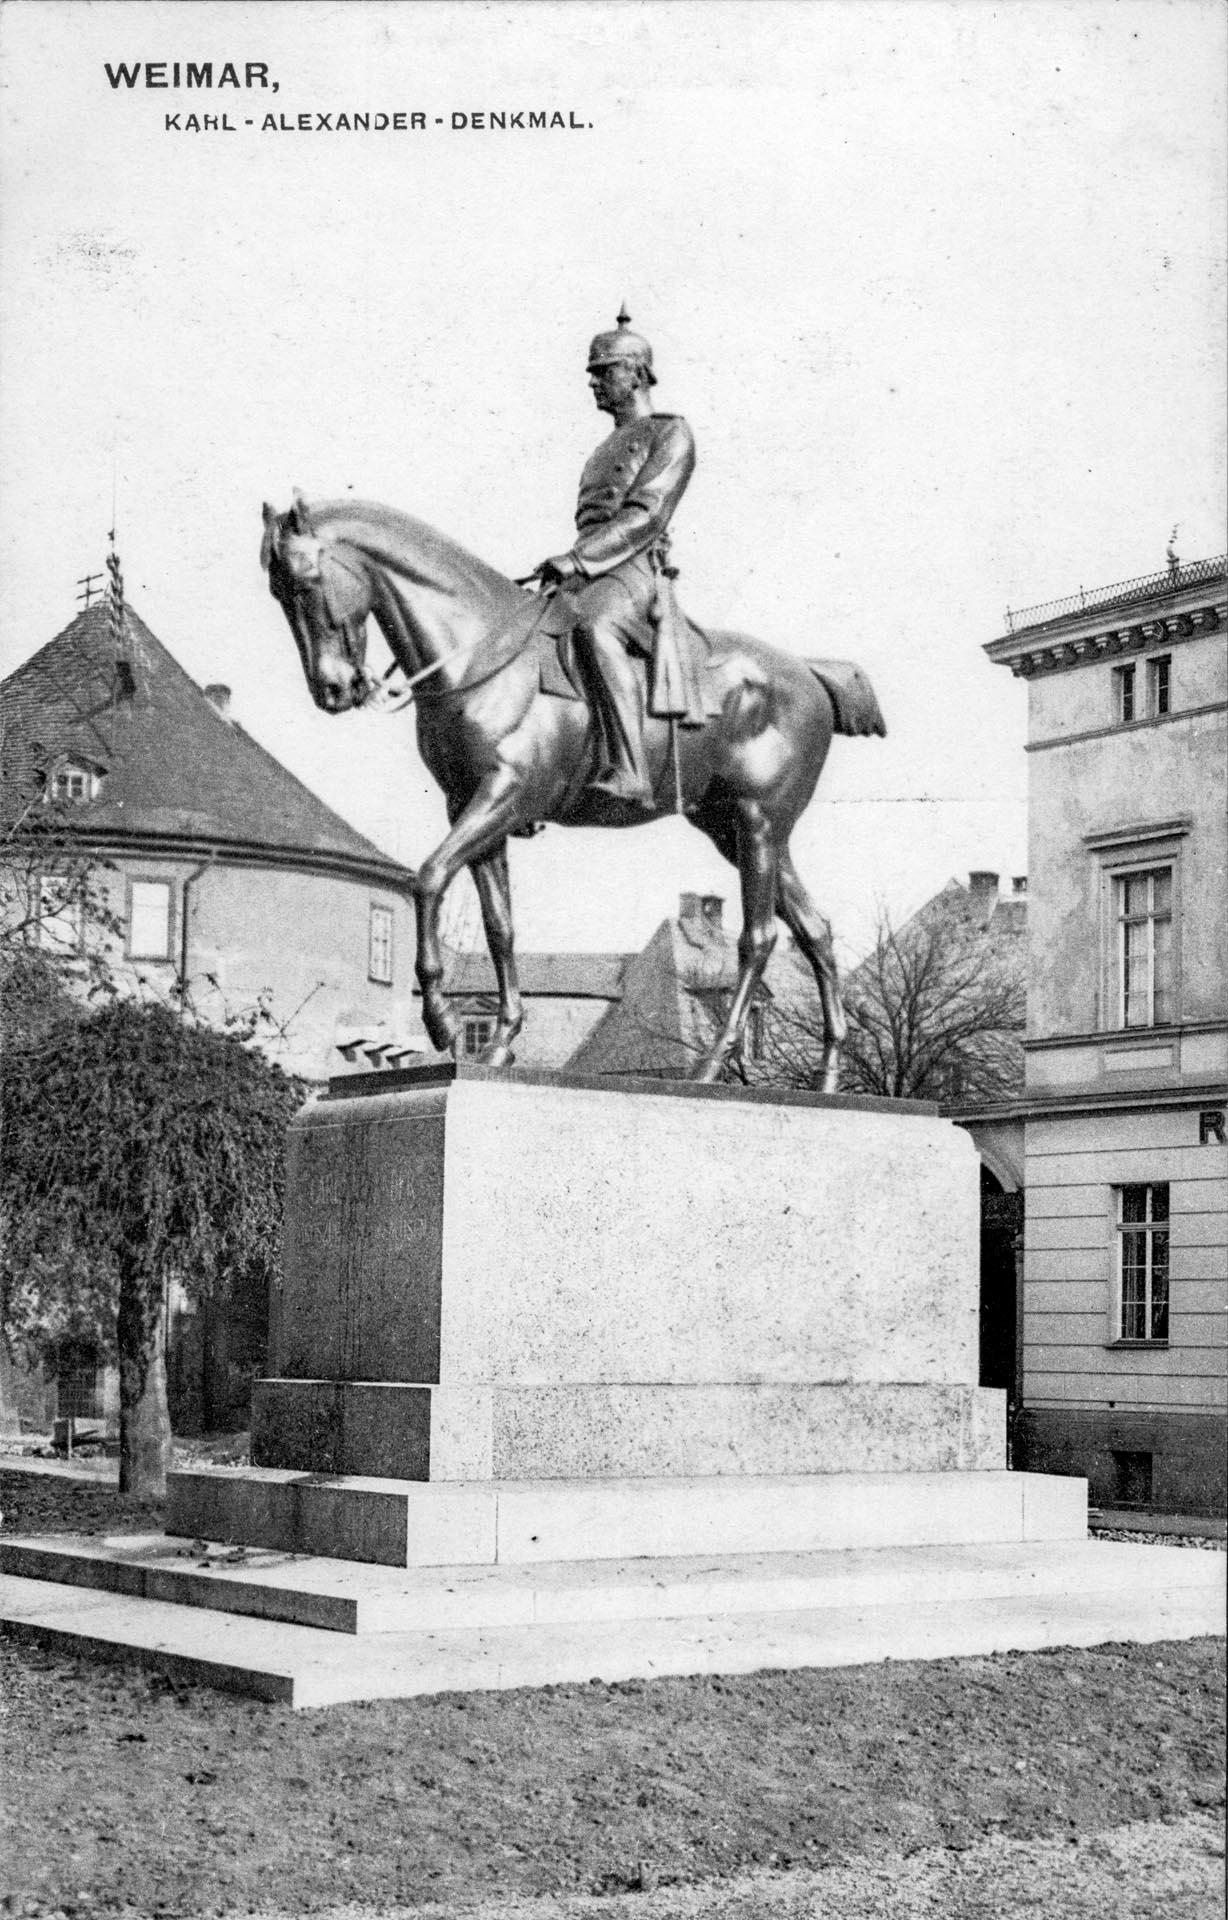 Karl Alexander Denkmal